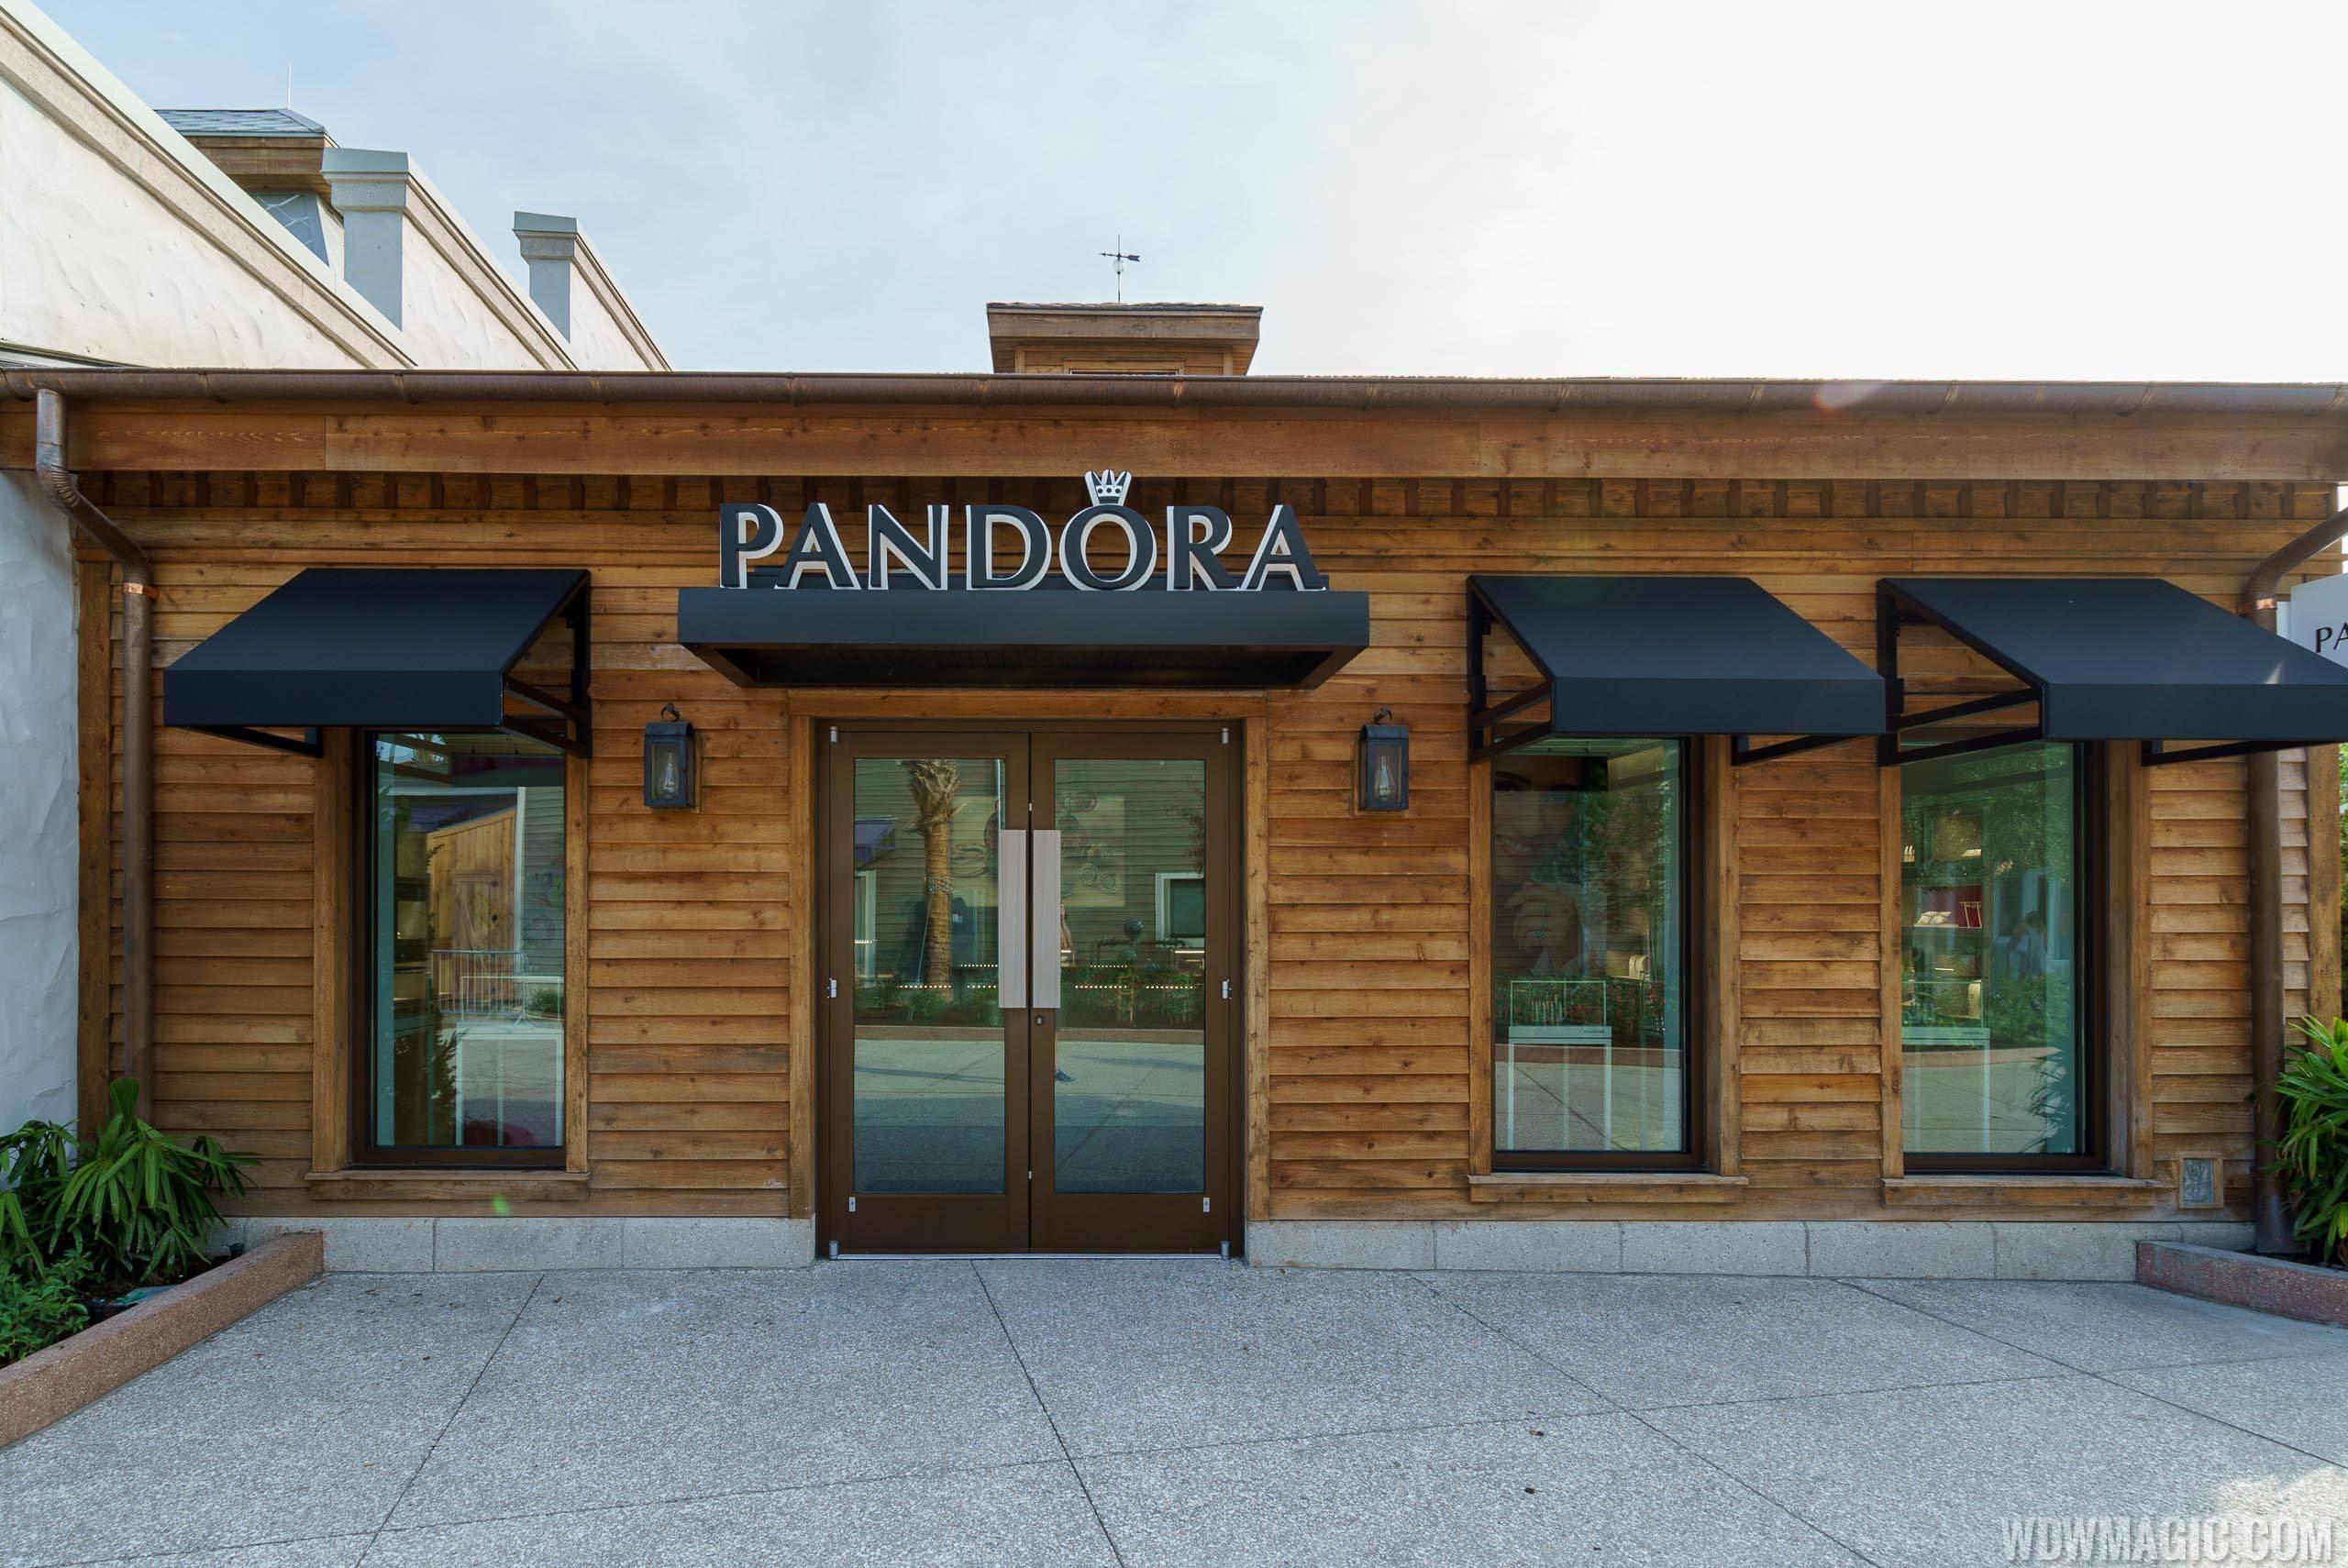 Pandora overview